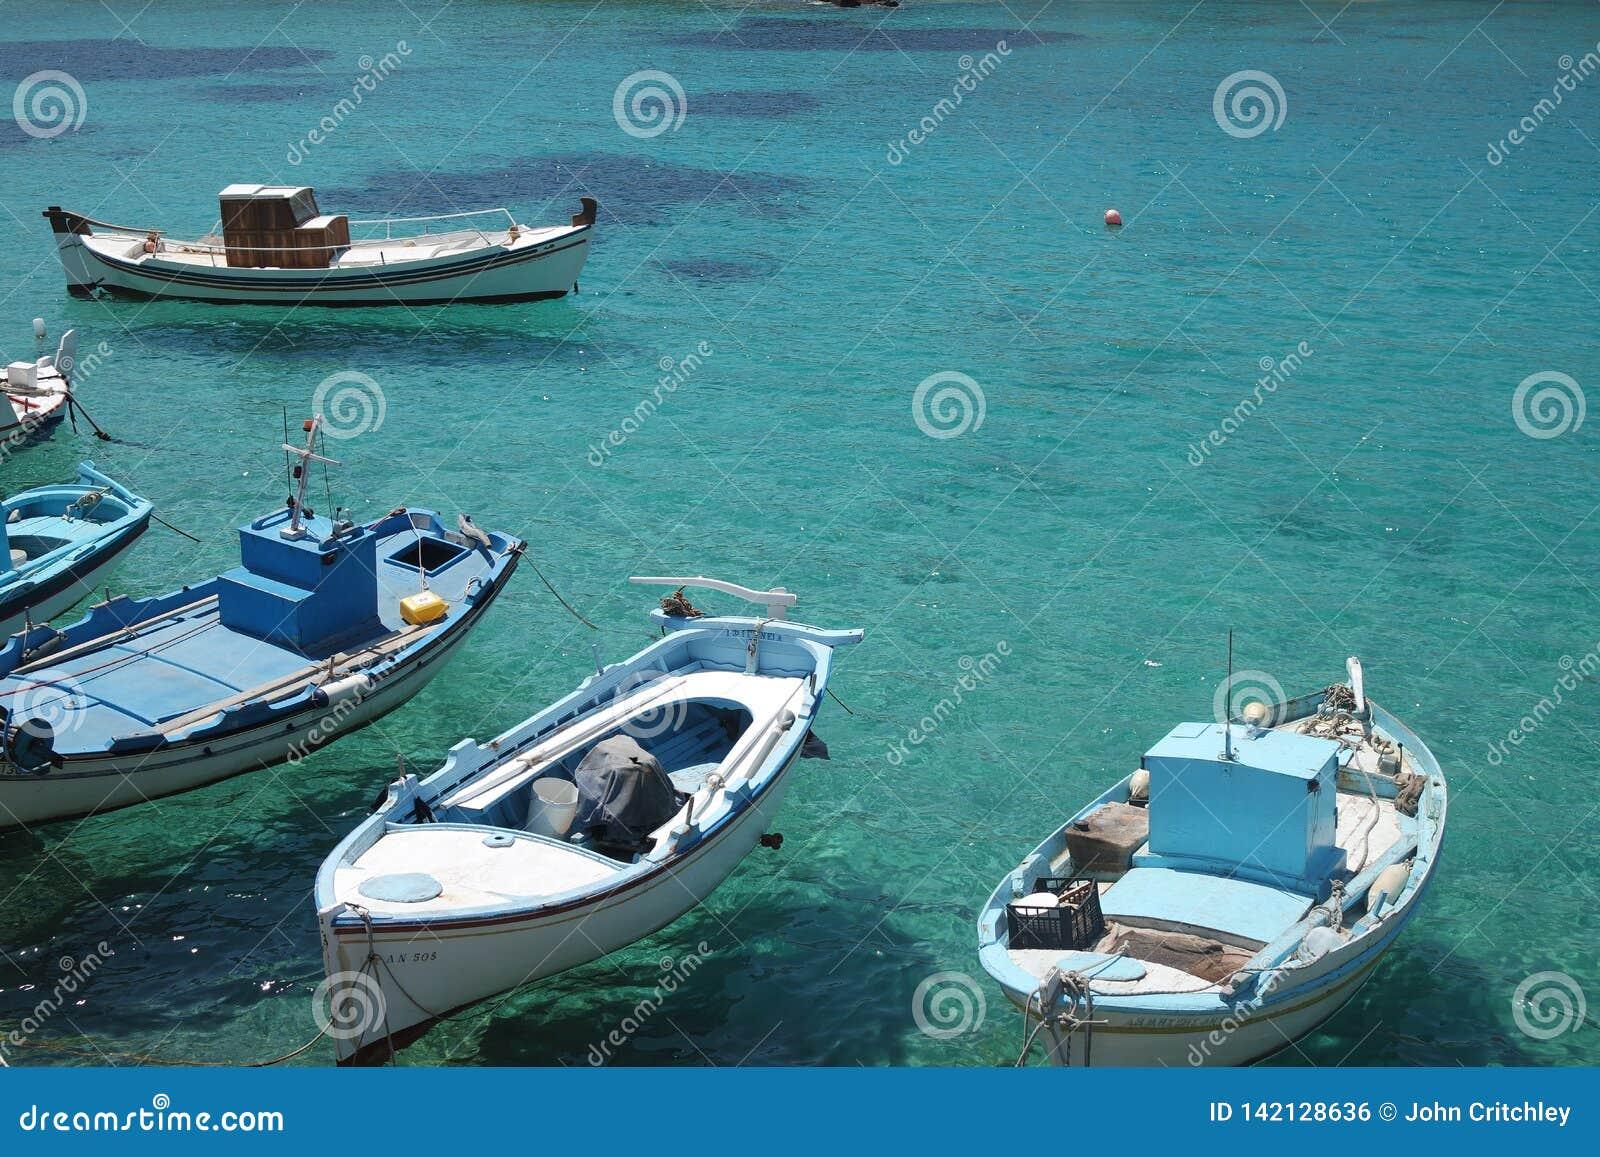 Greece, the island of Irakleia, fishing boats